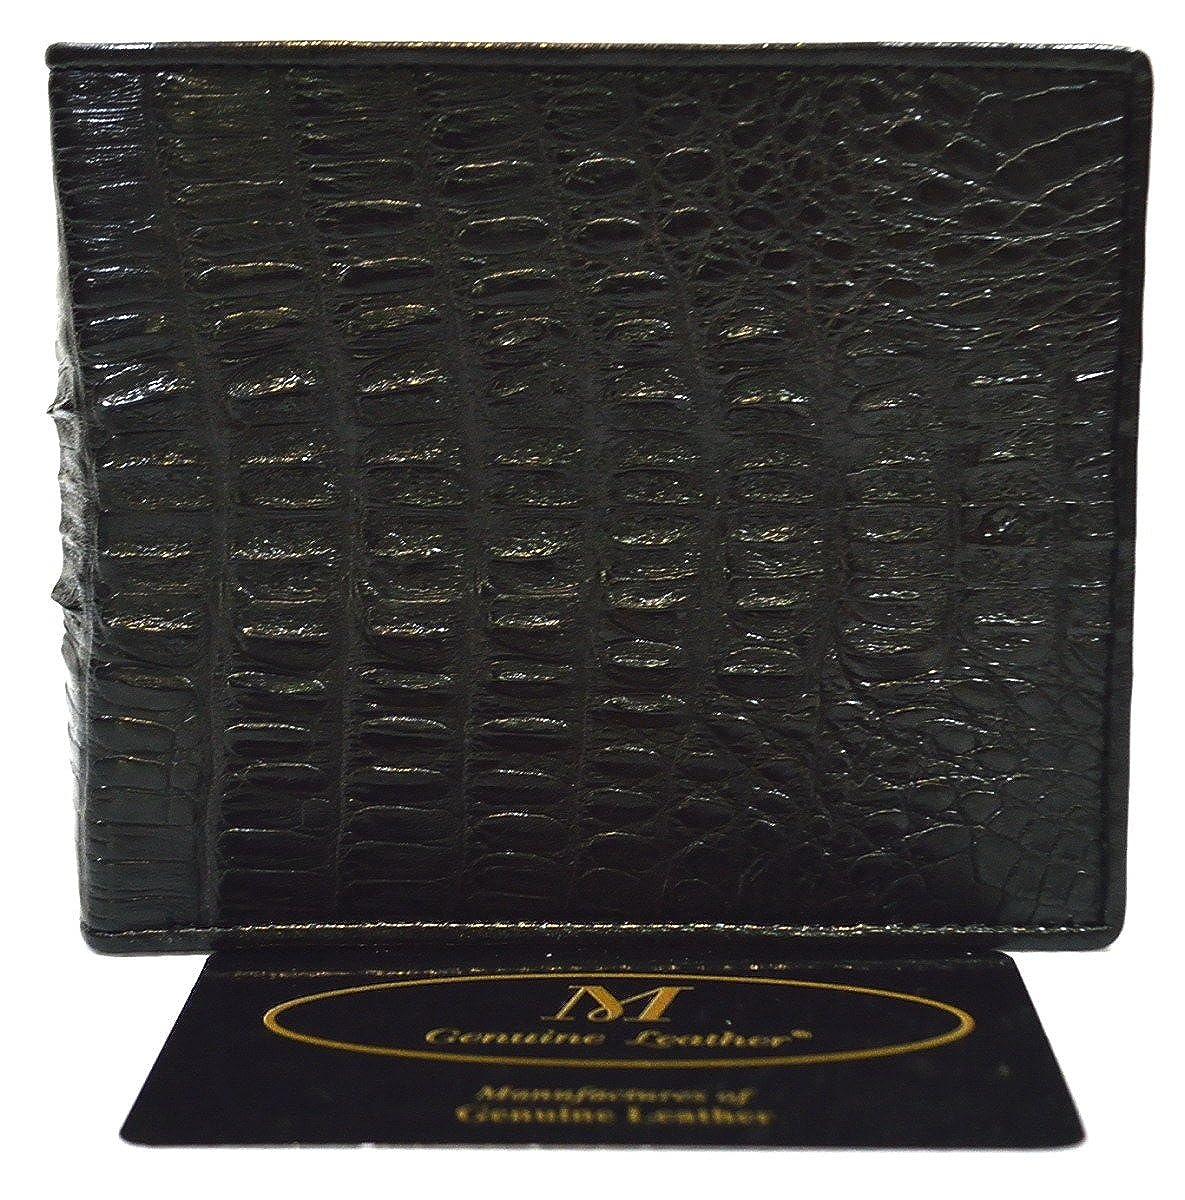 Authentic M Crocodile Skin Mens Bifold Crocodile Tail Skin Leather Black Wallet